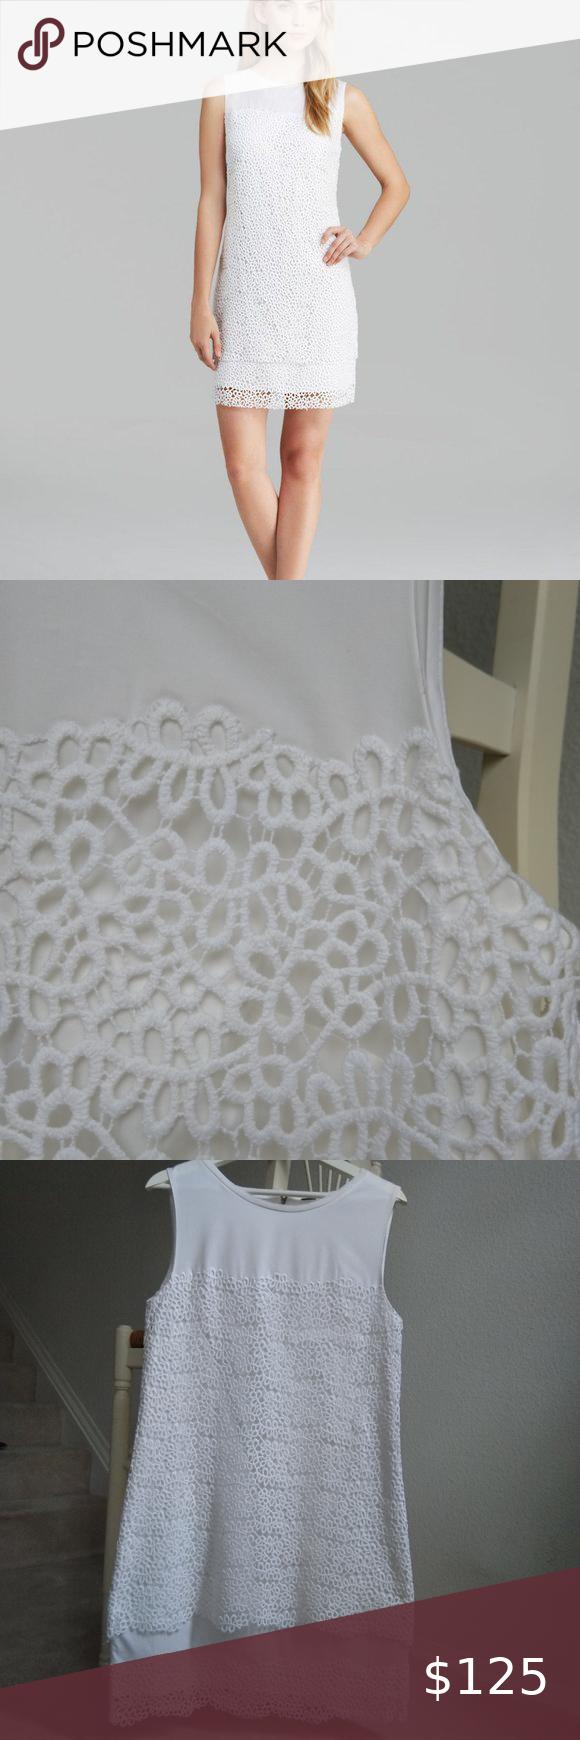 Elie Tahari White Lillian Vine Lace Dress Size 8 Lace Dress Elie Tahari Dresses Colorful Dresses [ 1740 x 580 Pixel ]